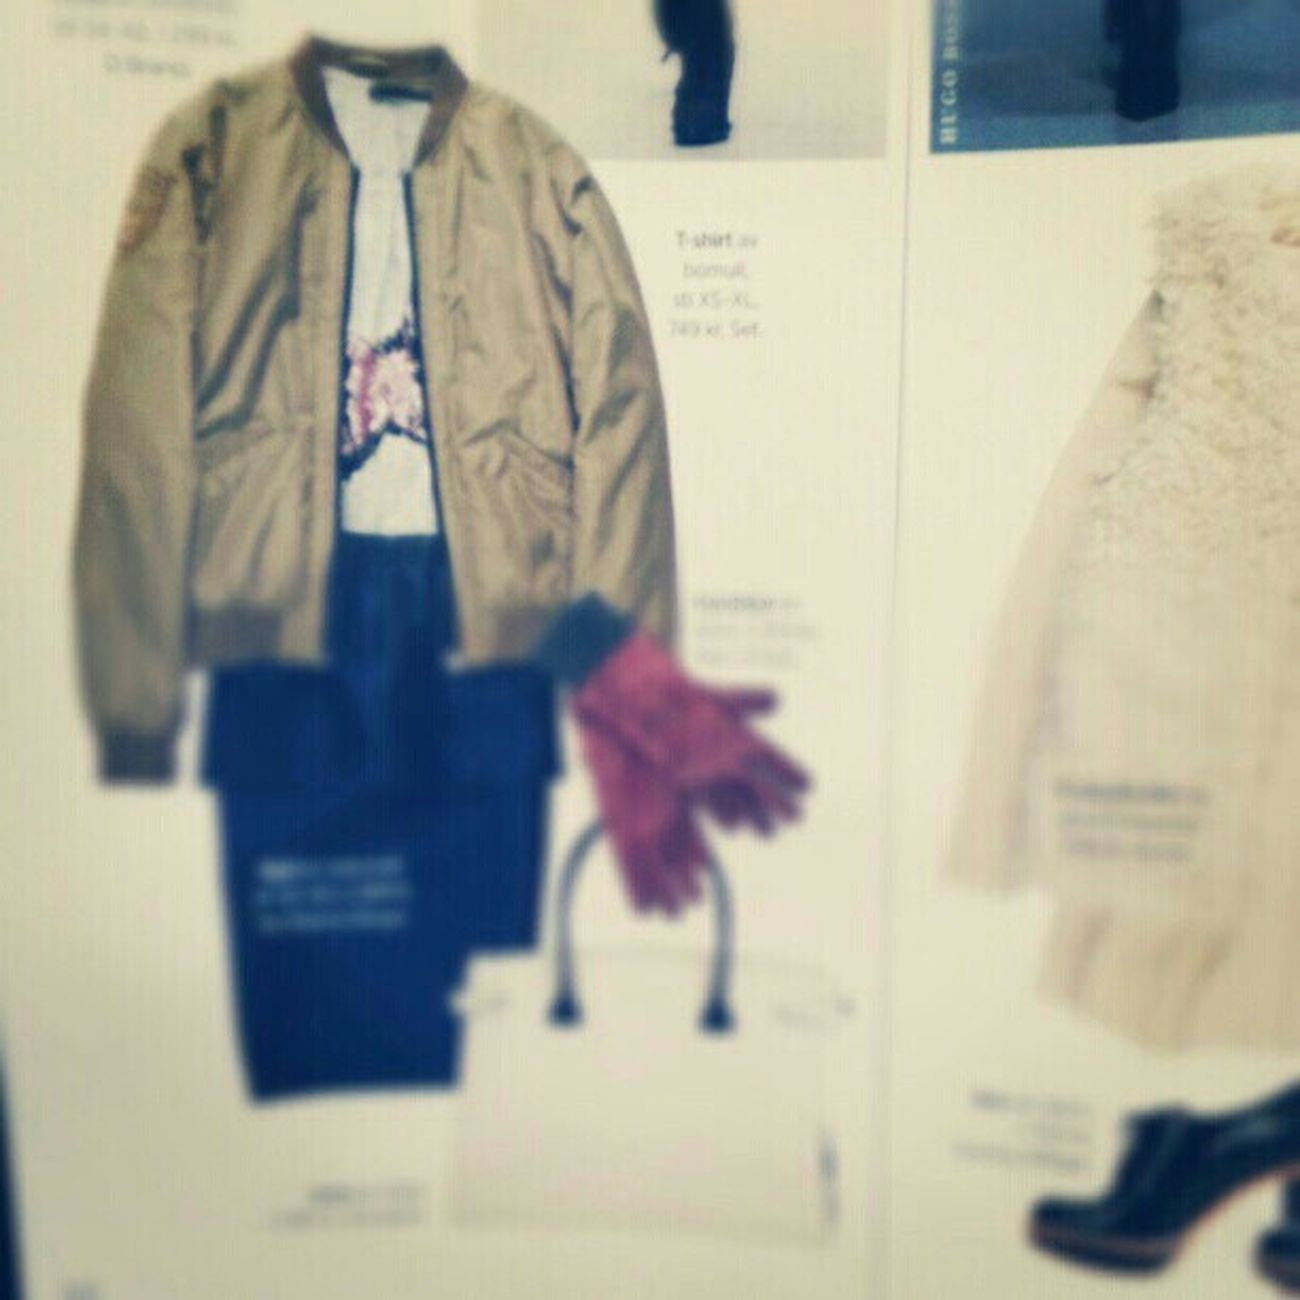 Dbrand Fashion Mode Dbrand .seBlogg Magazine Damernas Värld PR - d.brand Bomber